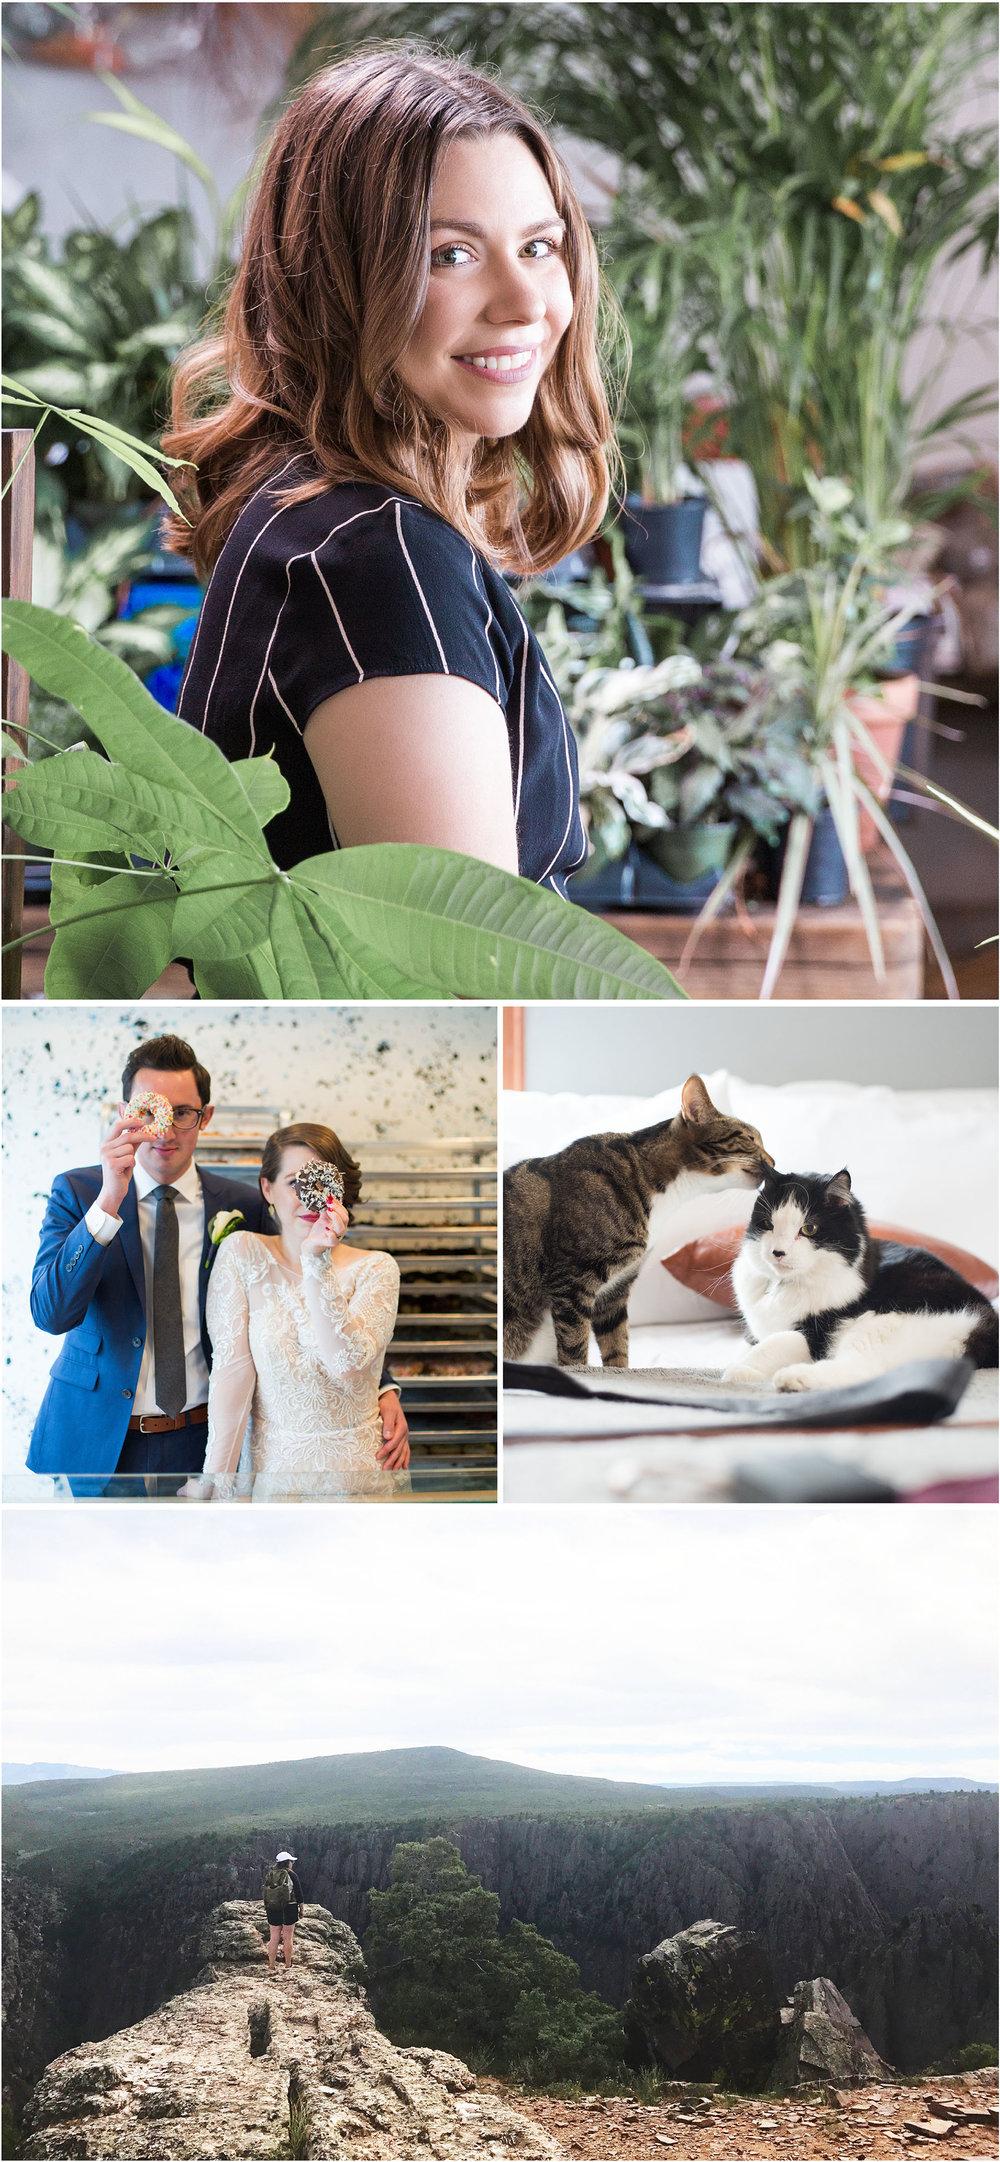 Leighwood Design Studio | About Amanda | Custom Wedding Invitation Design in St. Louis, Missouri